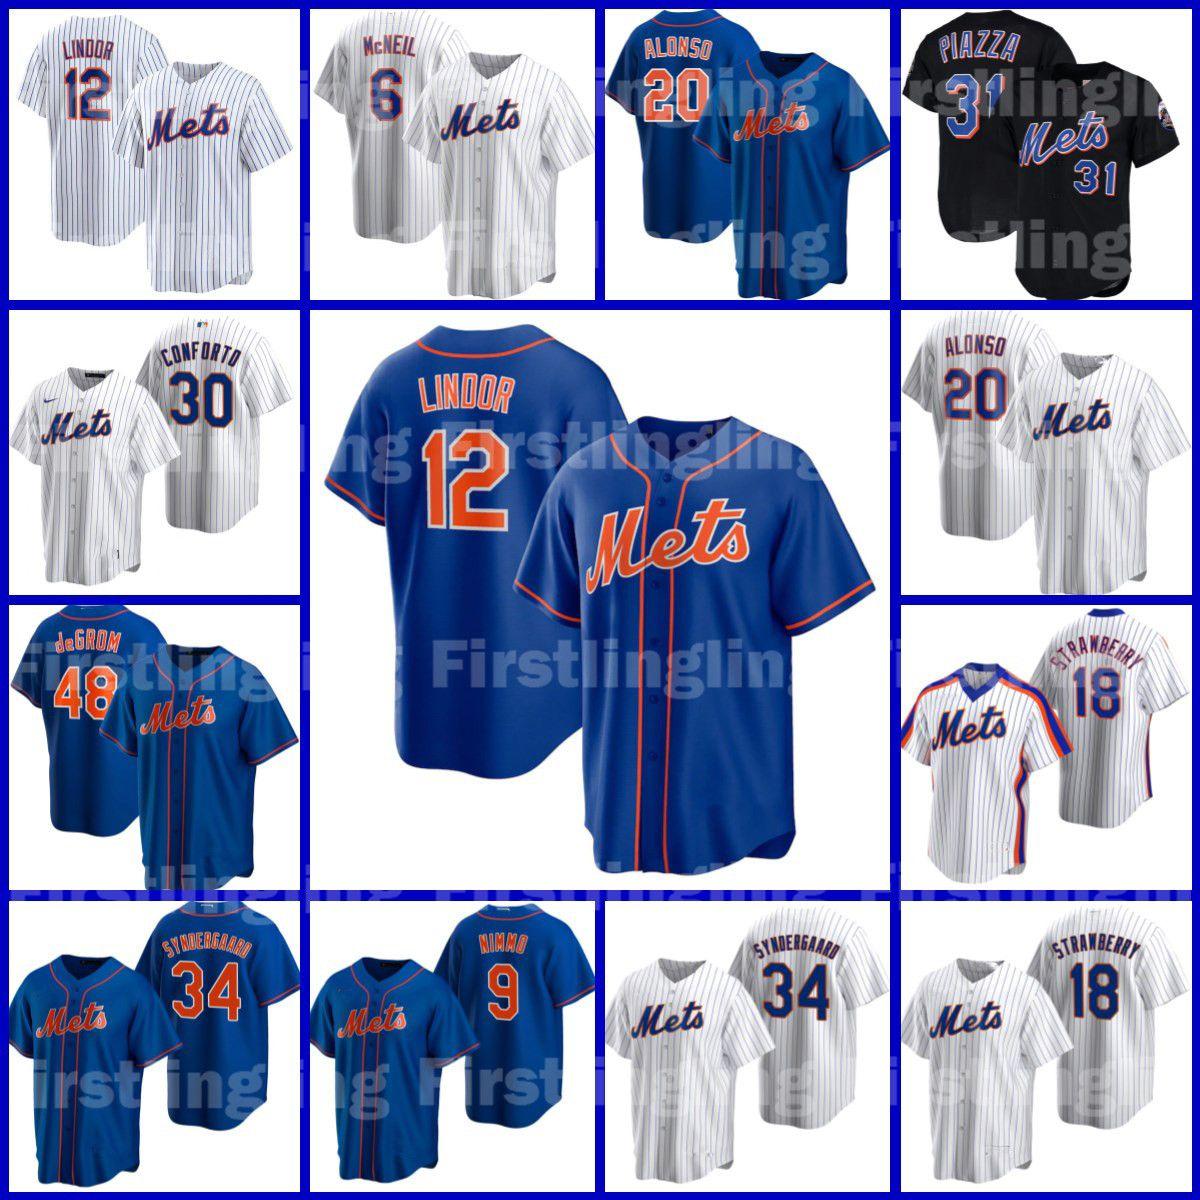 12 Francisco Lindor Custom Mets Бейсбол Джерси 48 Якоб Deemom Pete Alonso New Джефф York Mcneil Tom See Sea Chean Mike Piazza Noah Syndergaard